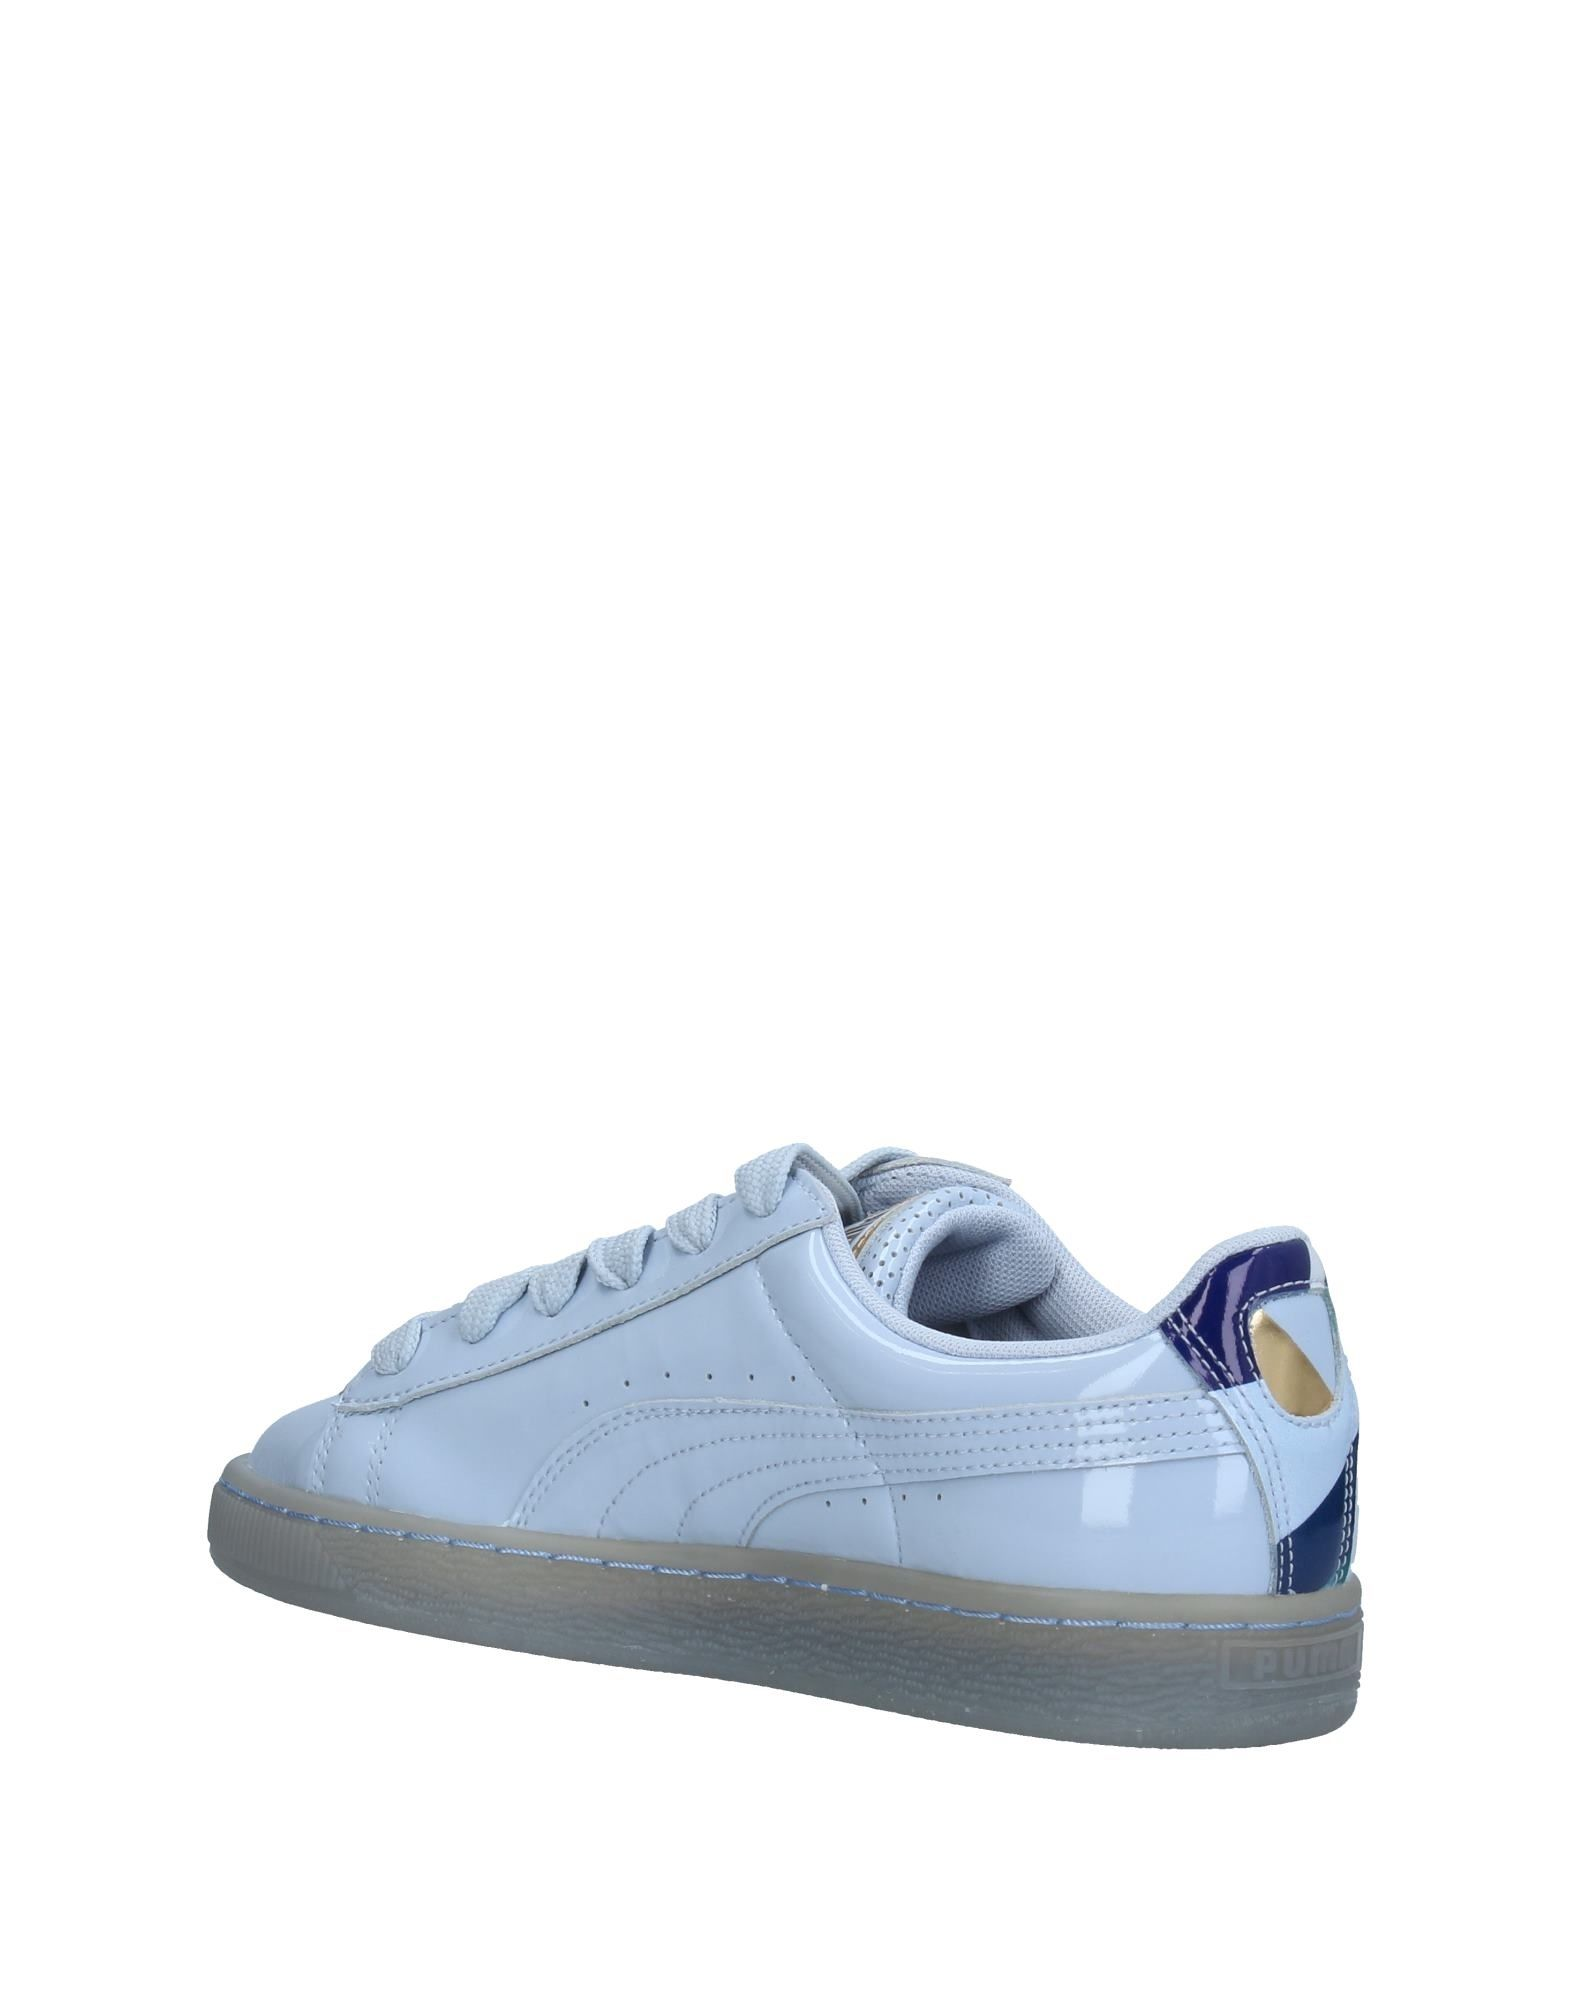 Puma X Careaux Sneakers Damen  Schuhe 11326492FX Gute Qualität beliebte Schuhe  f70c05